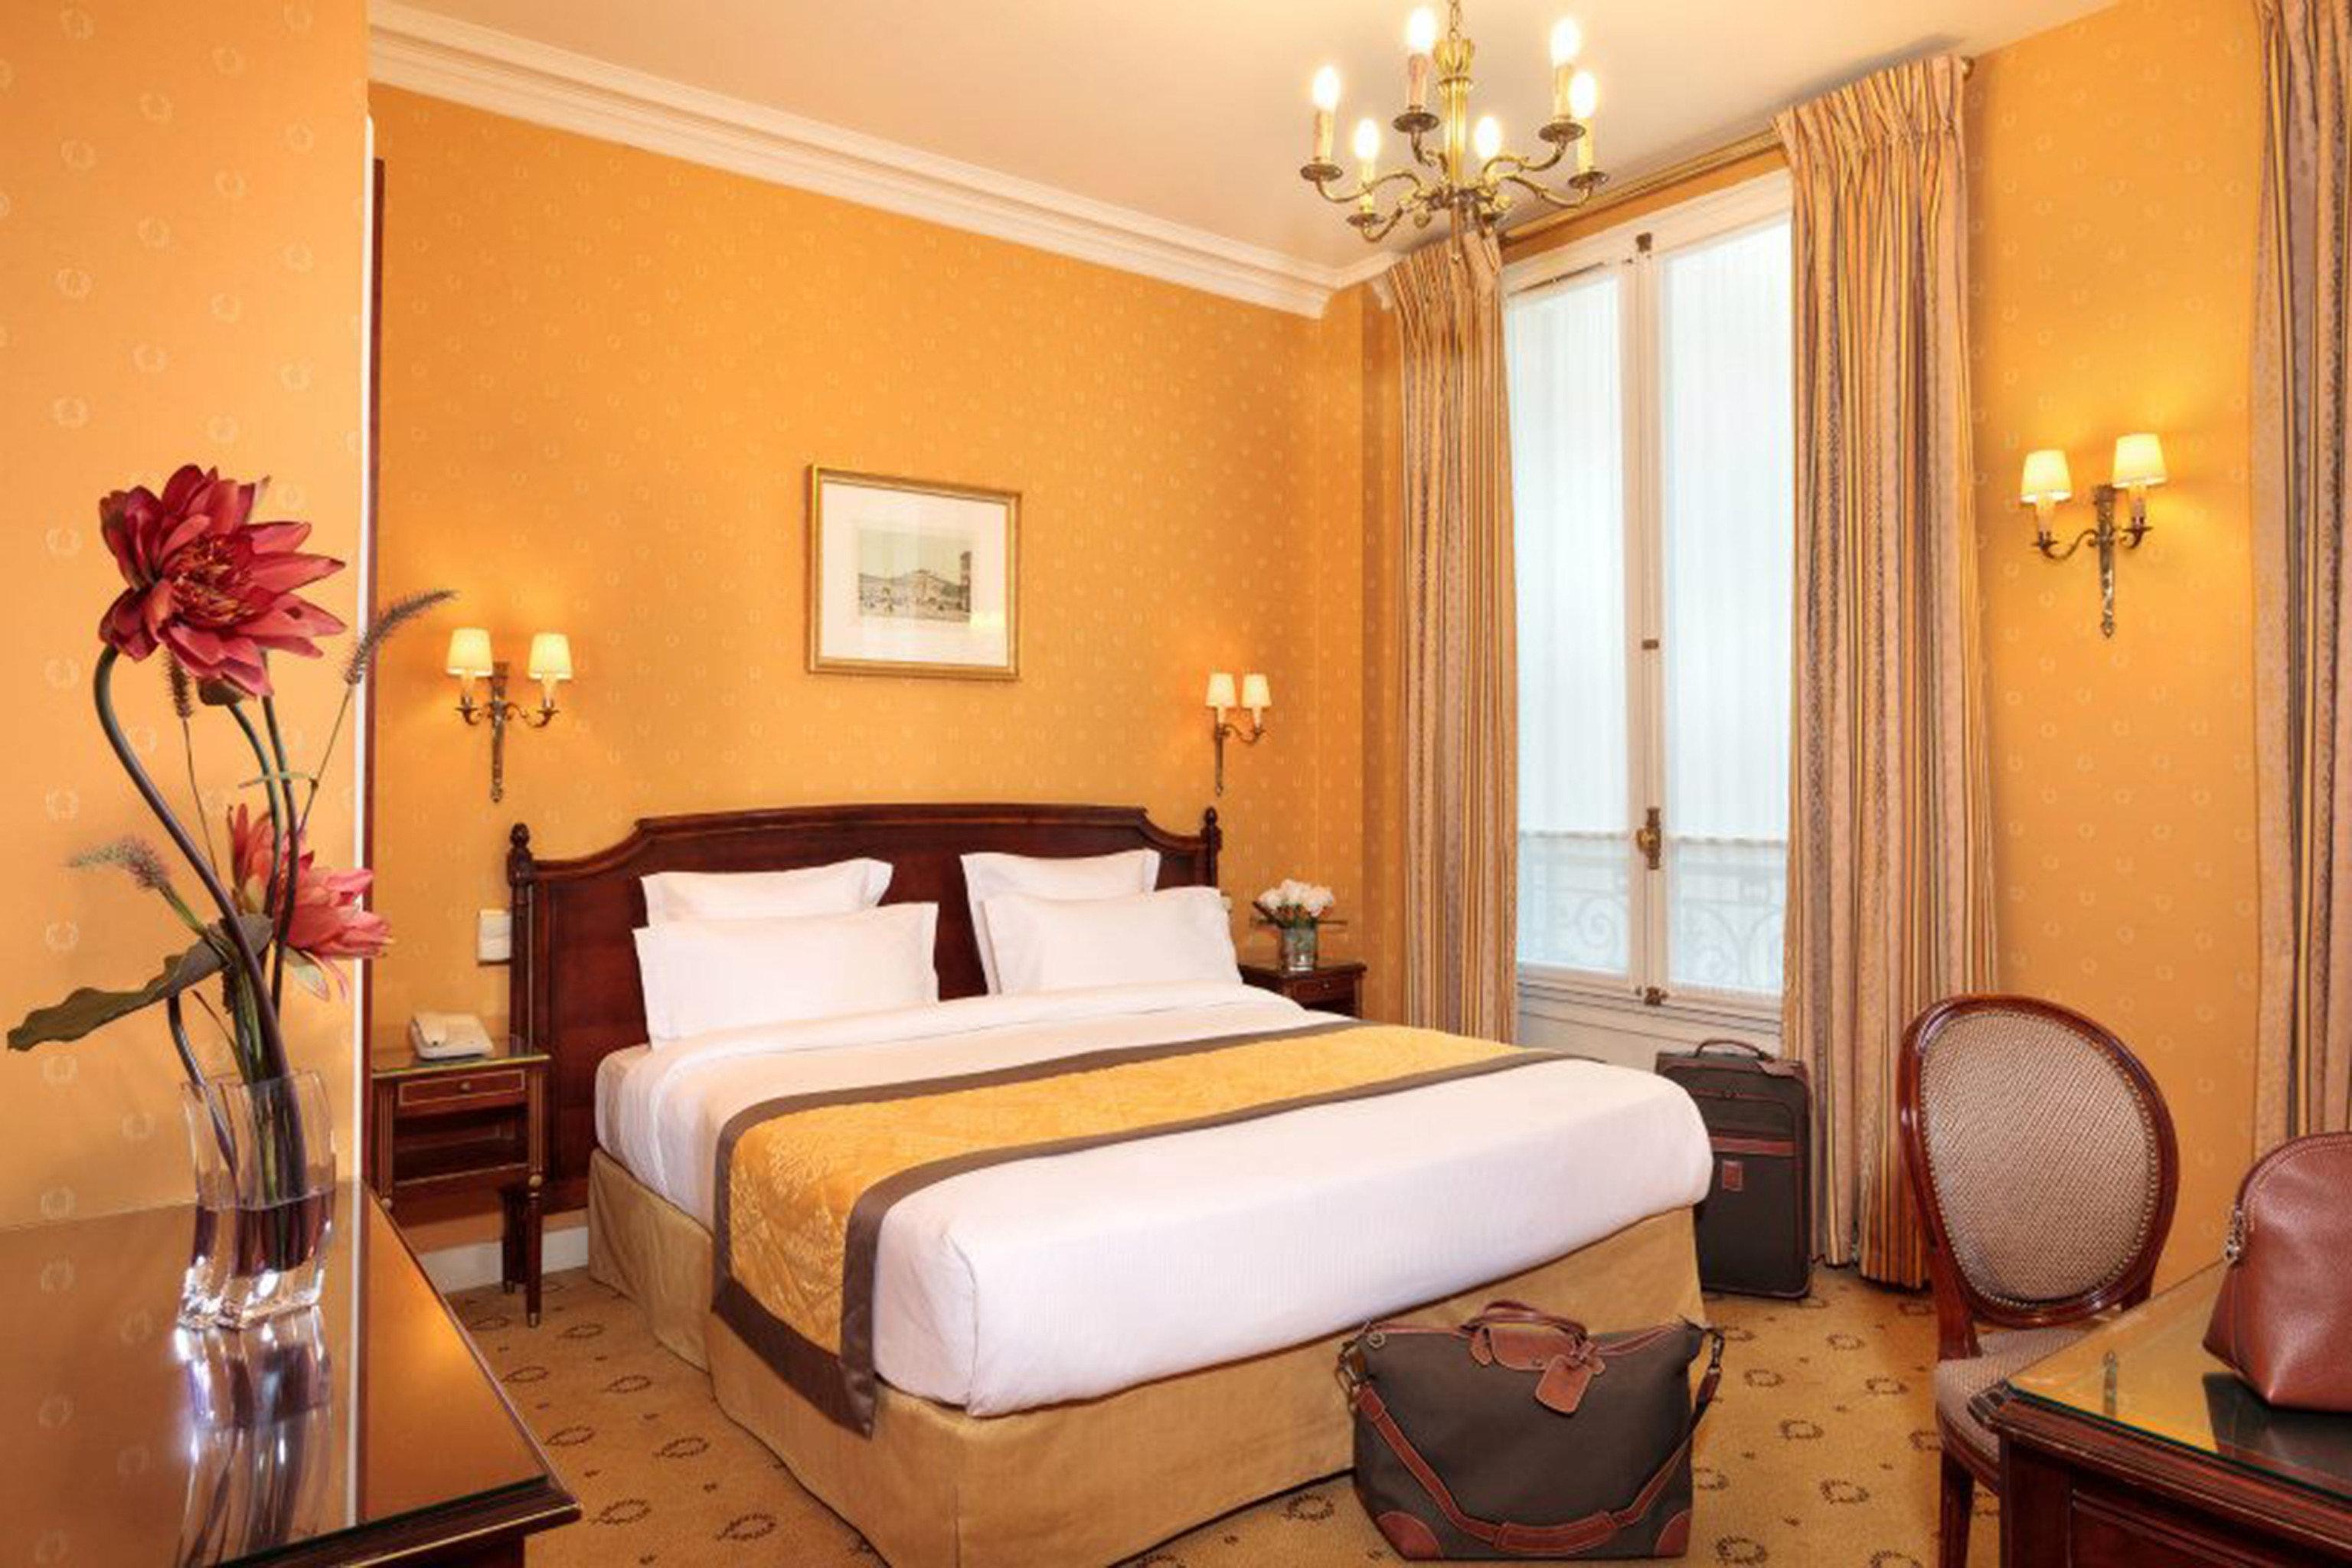 Bedroom Hip Historic Luxury Modern Rustic Suite property cottage